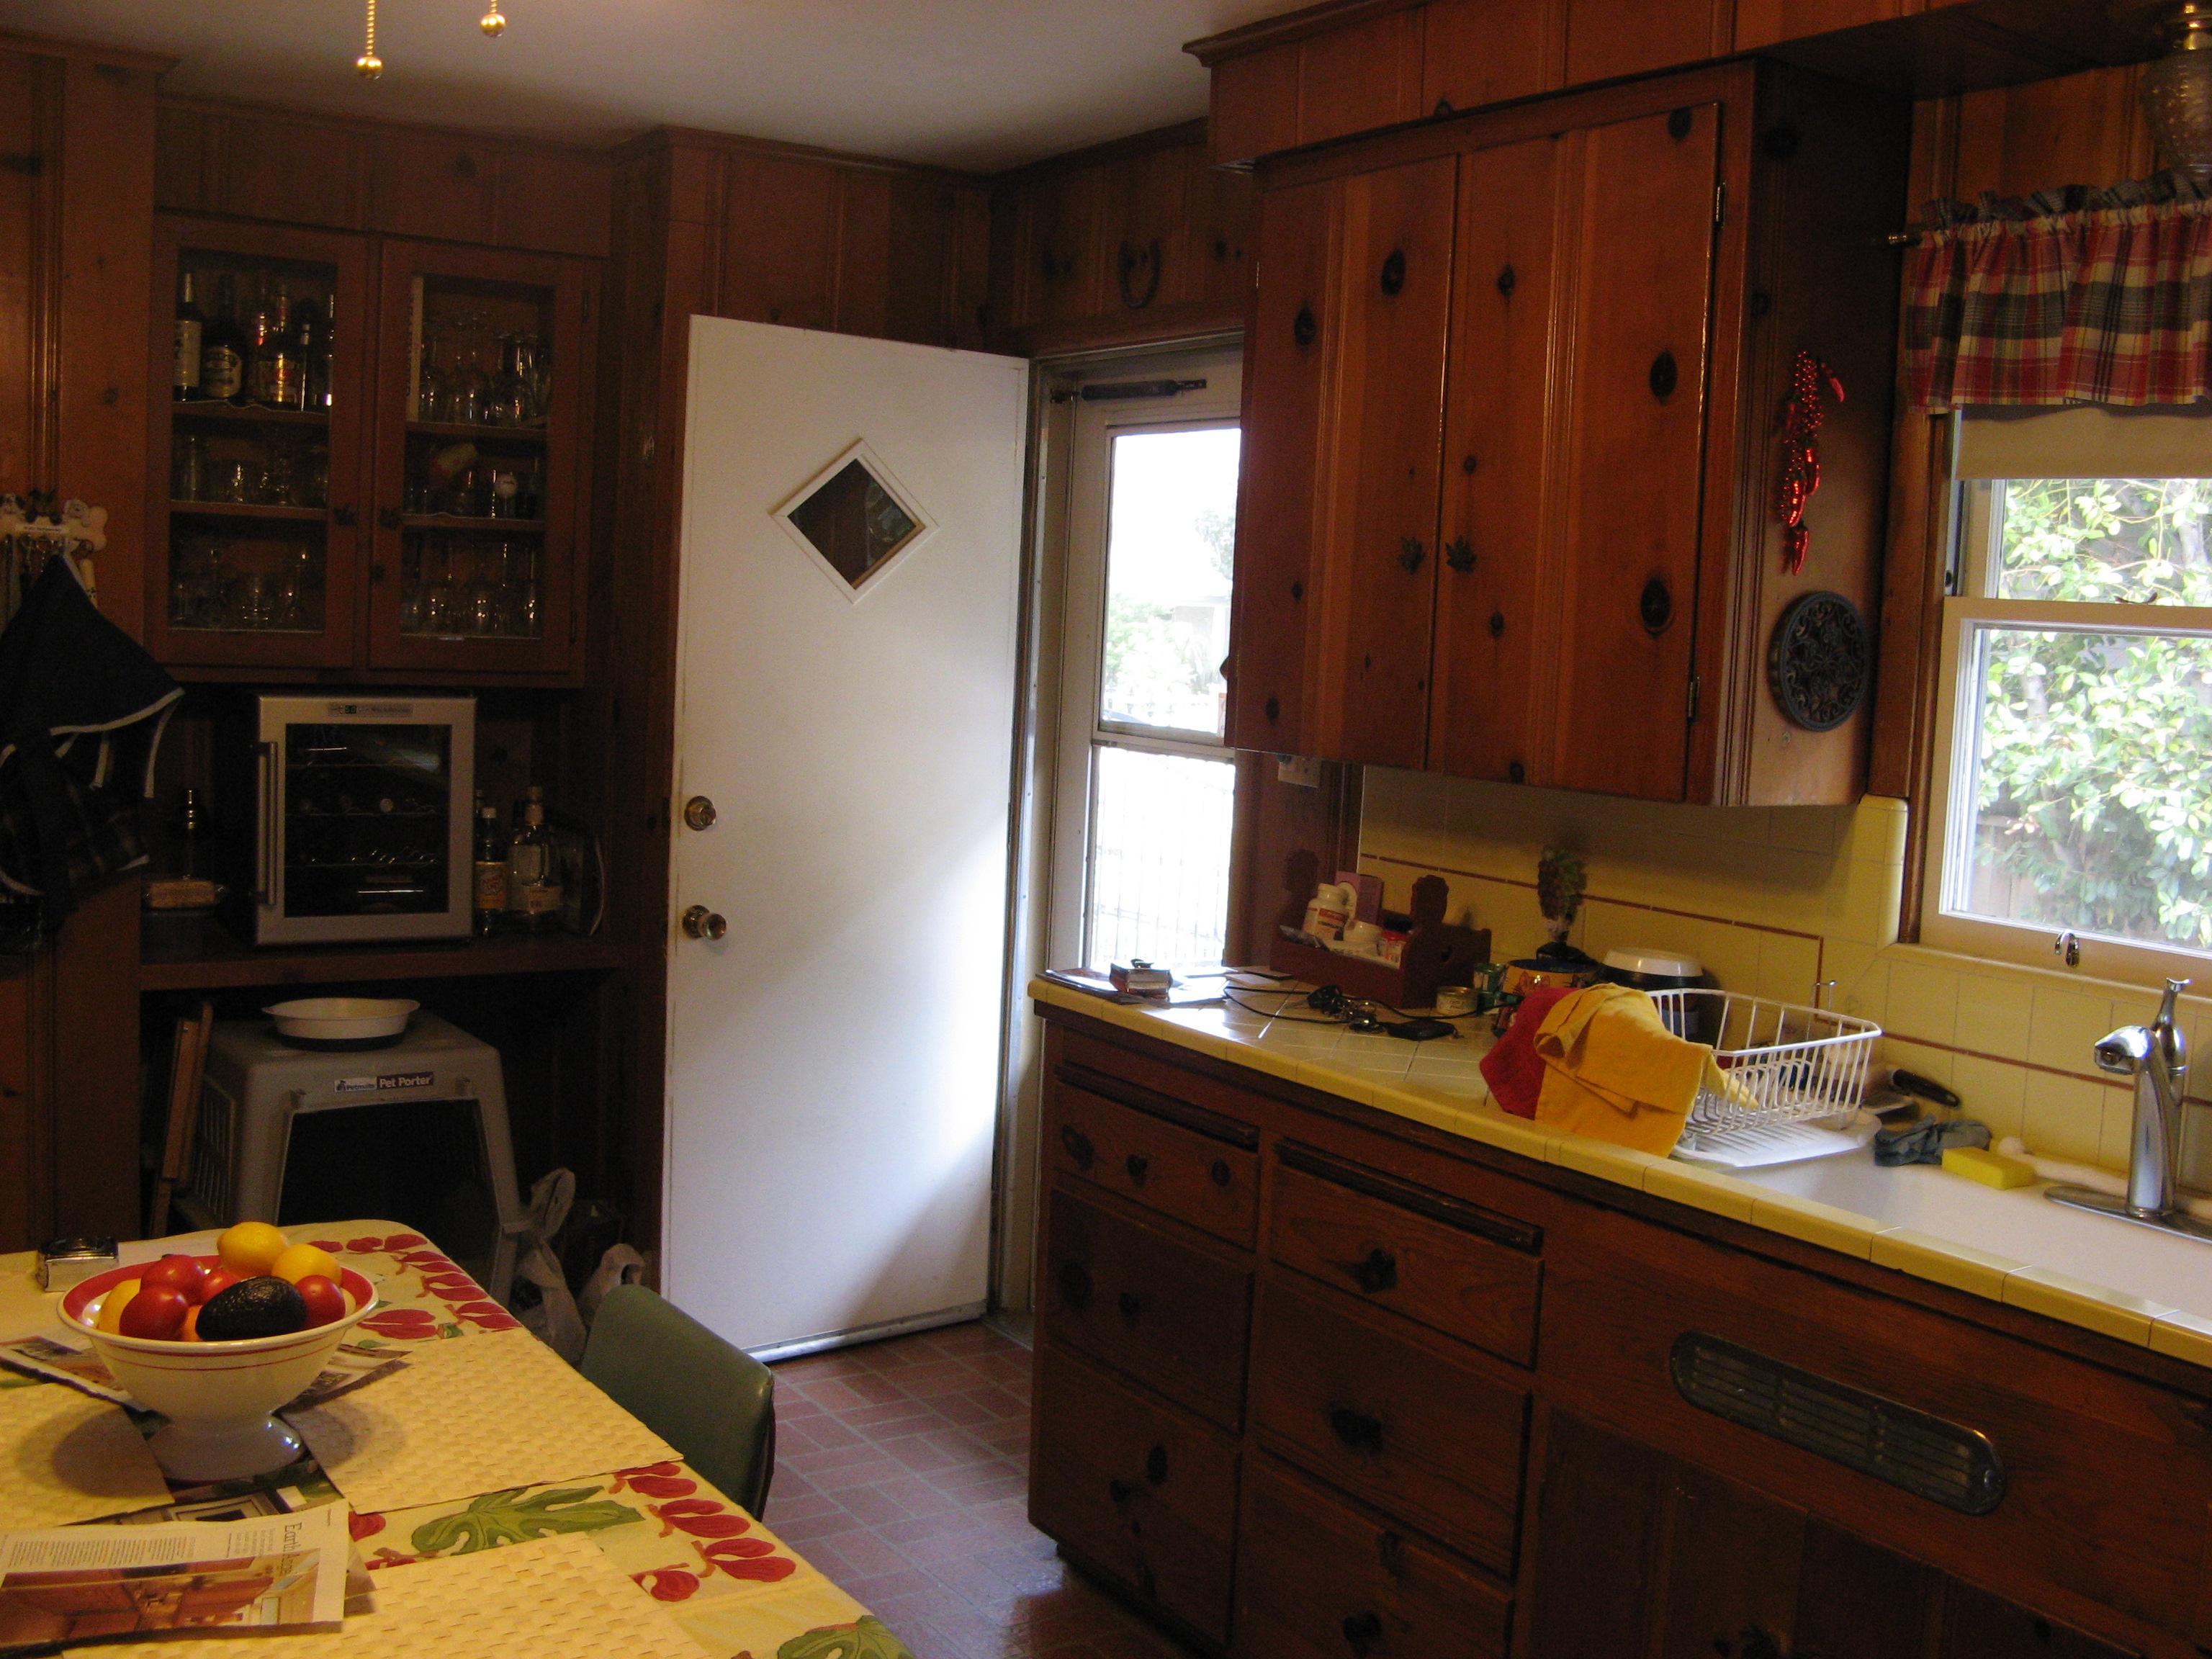 Knotty pine paneling and cabinets  Kitt Haman Design